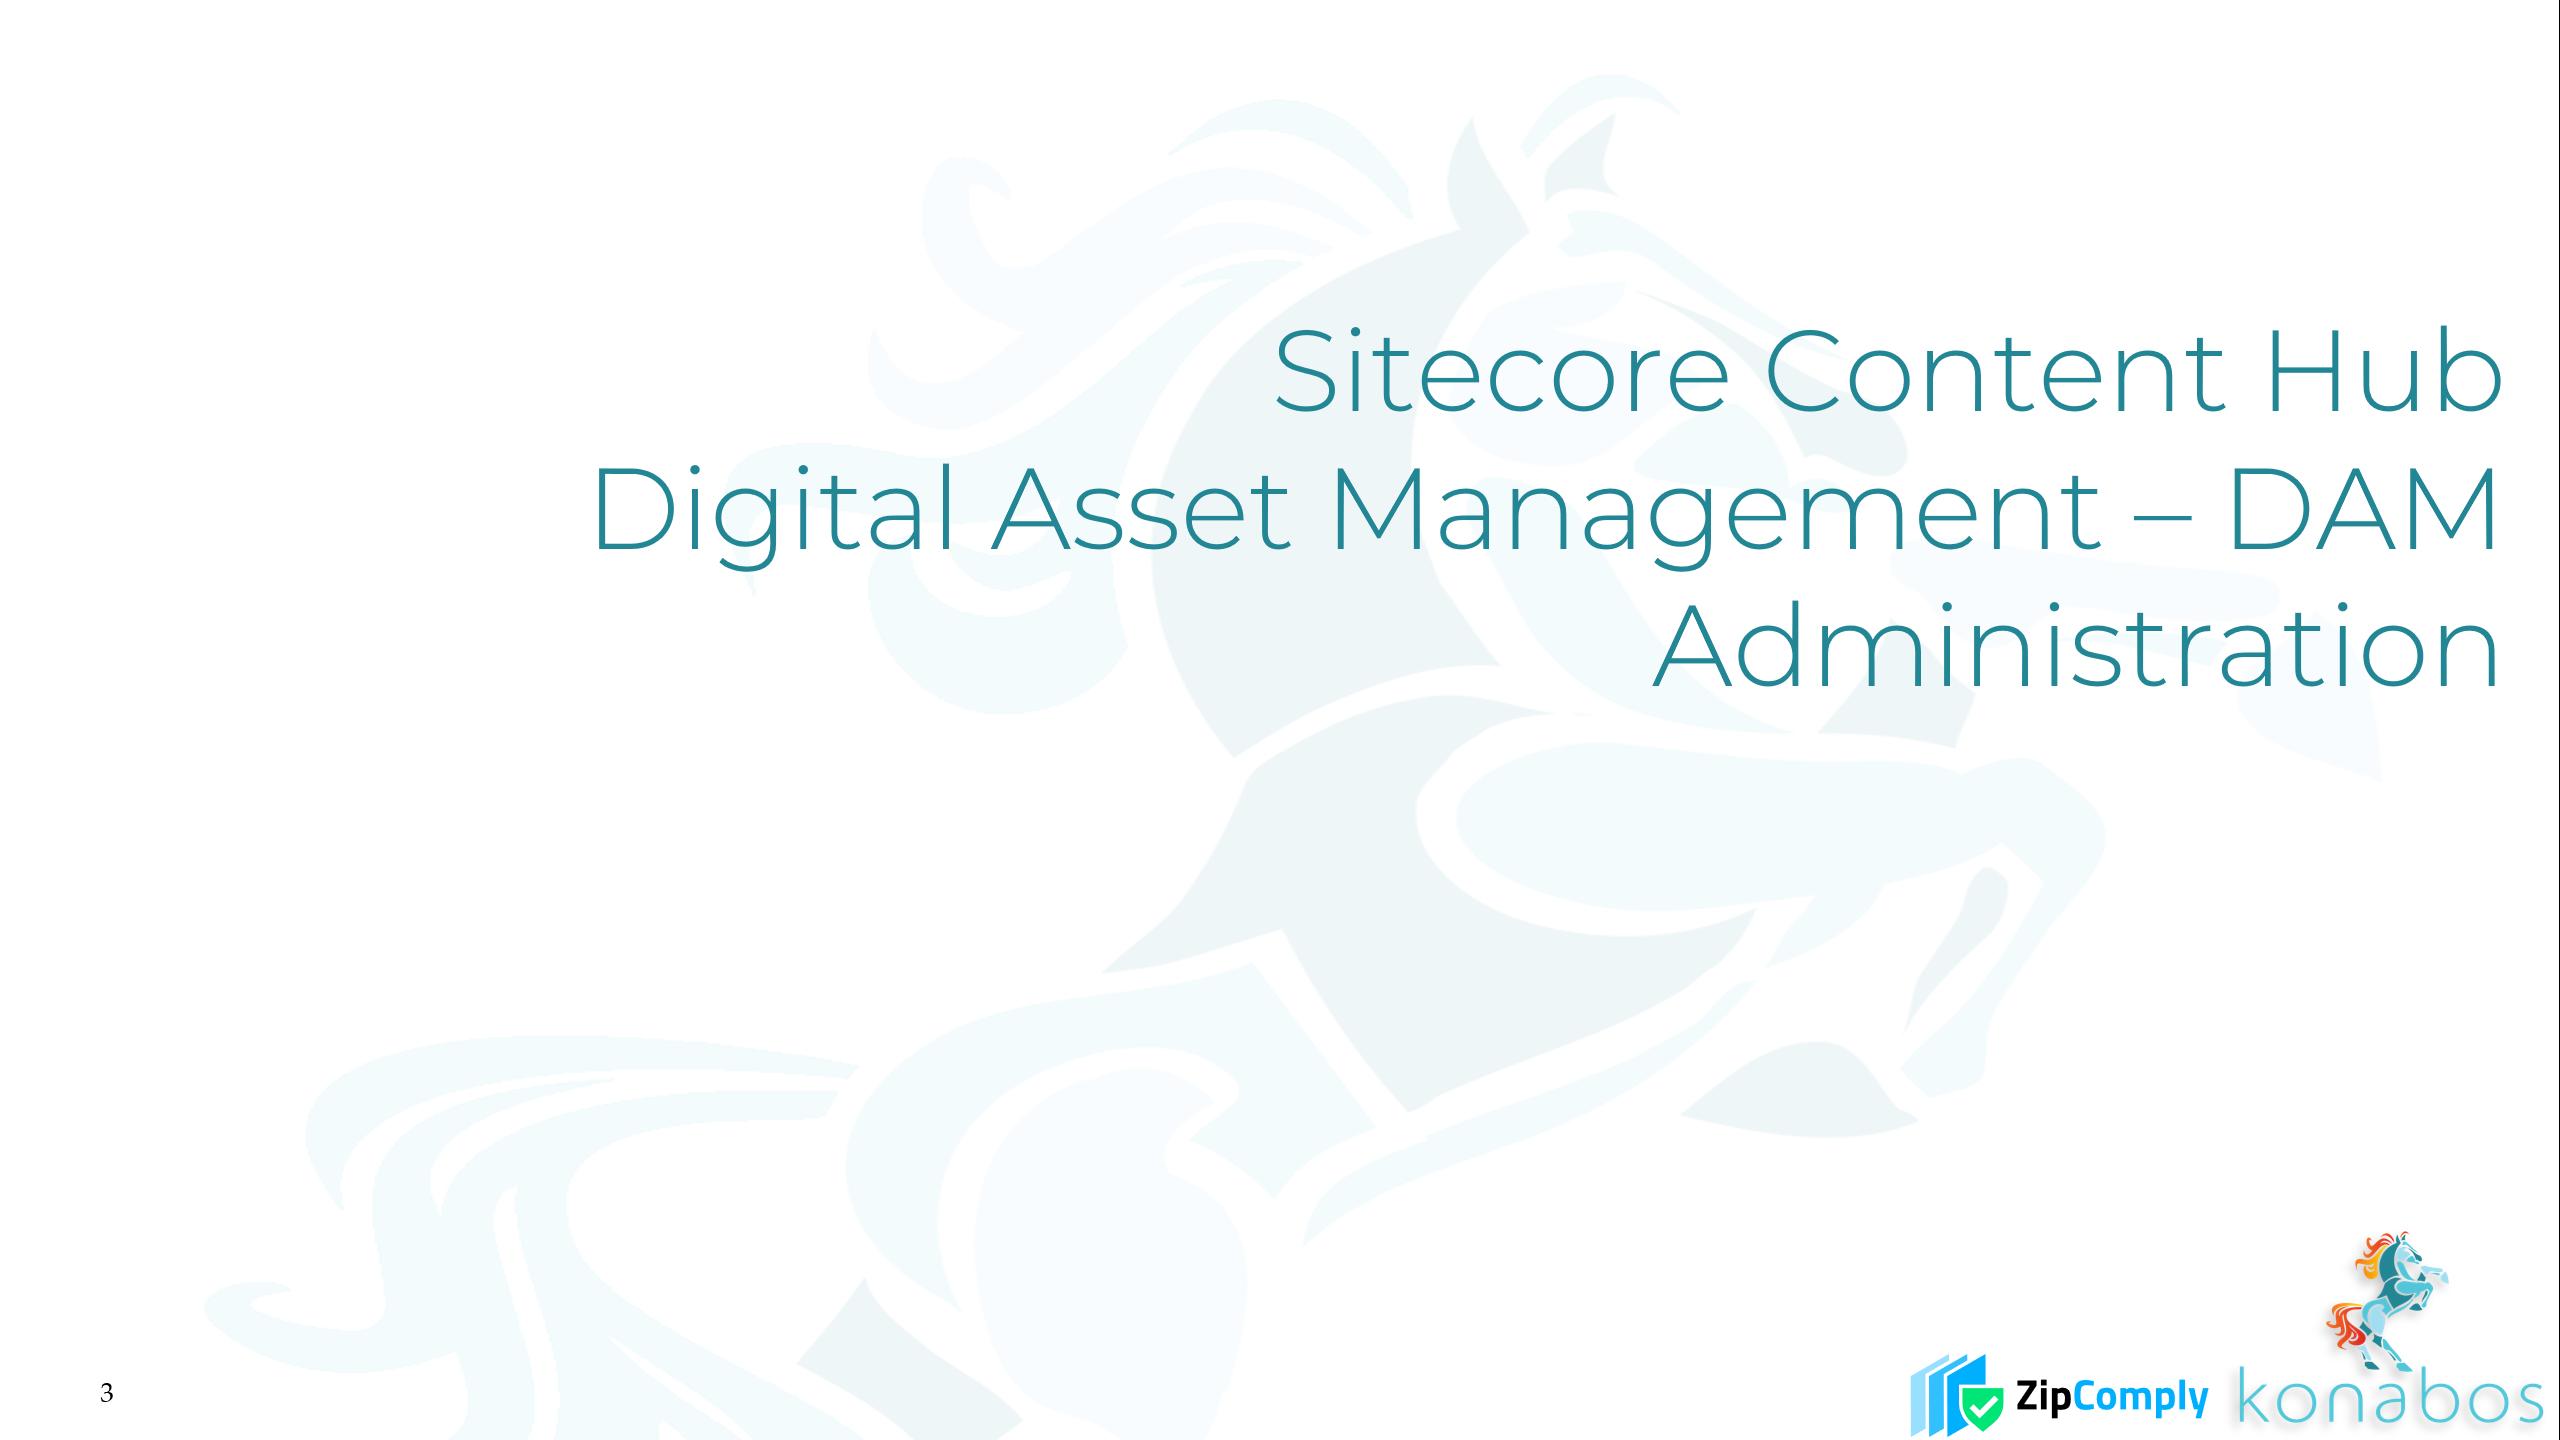 Sitecore Content Hub - Digital Asset Management - DAM - Administration